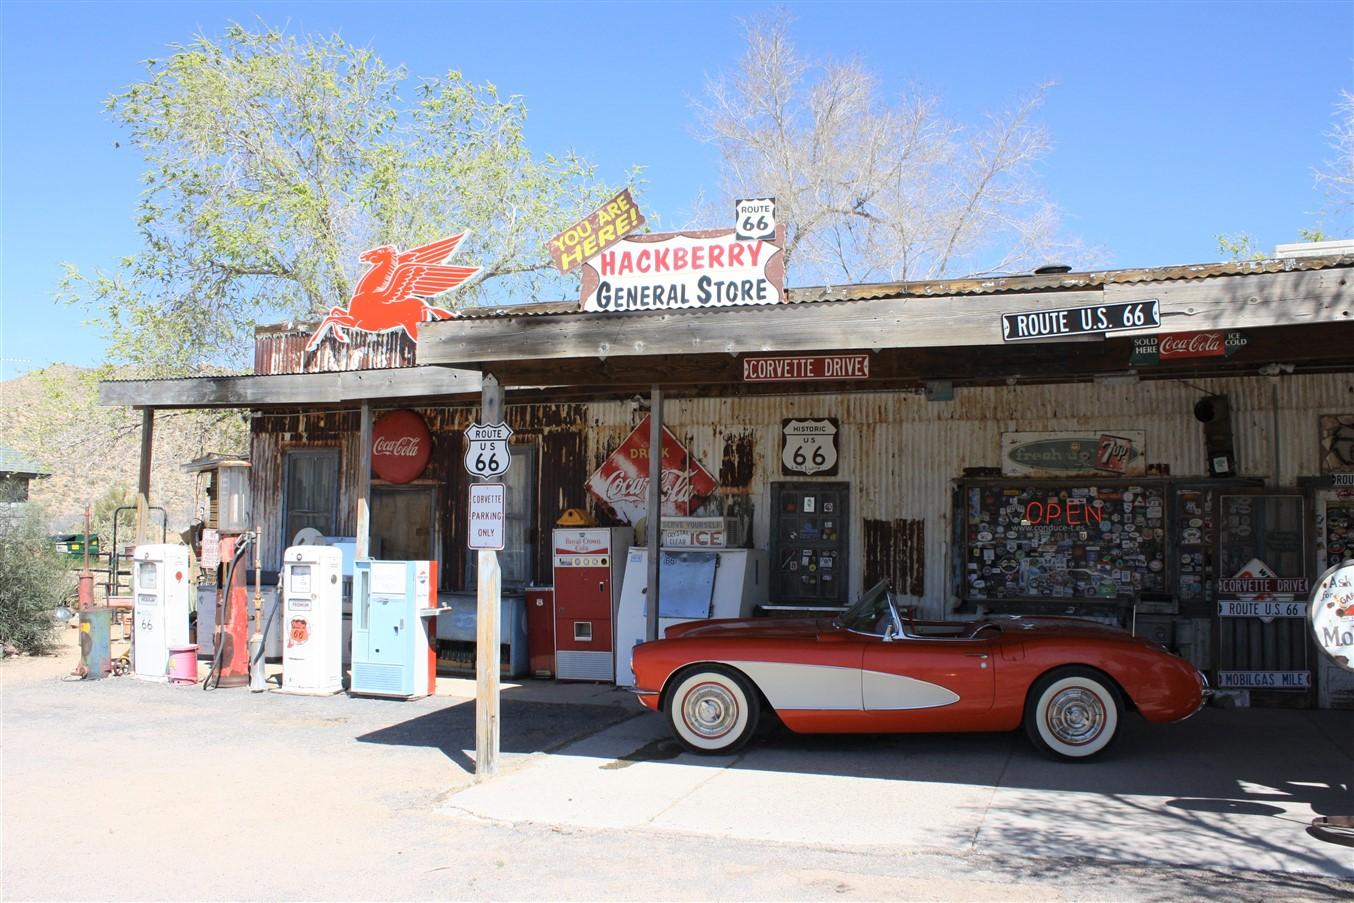 2012 03 14 Route 66 Road Trip 146 Hackberry Arizona.jpg